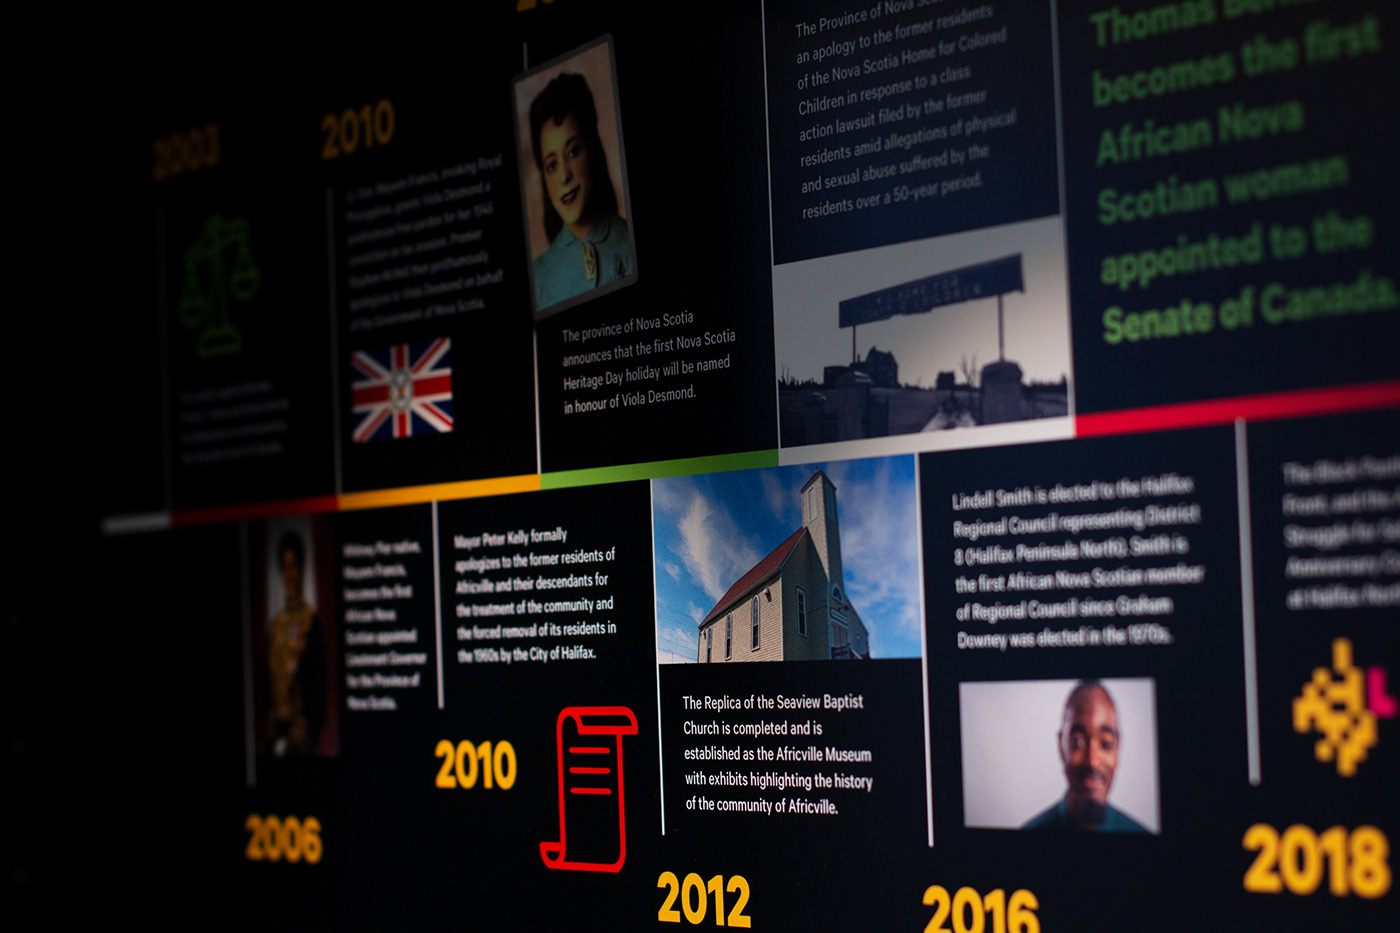 African Heritage Month Timeline Display